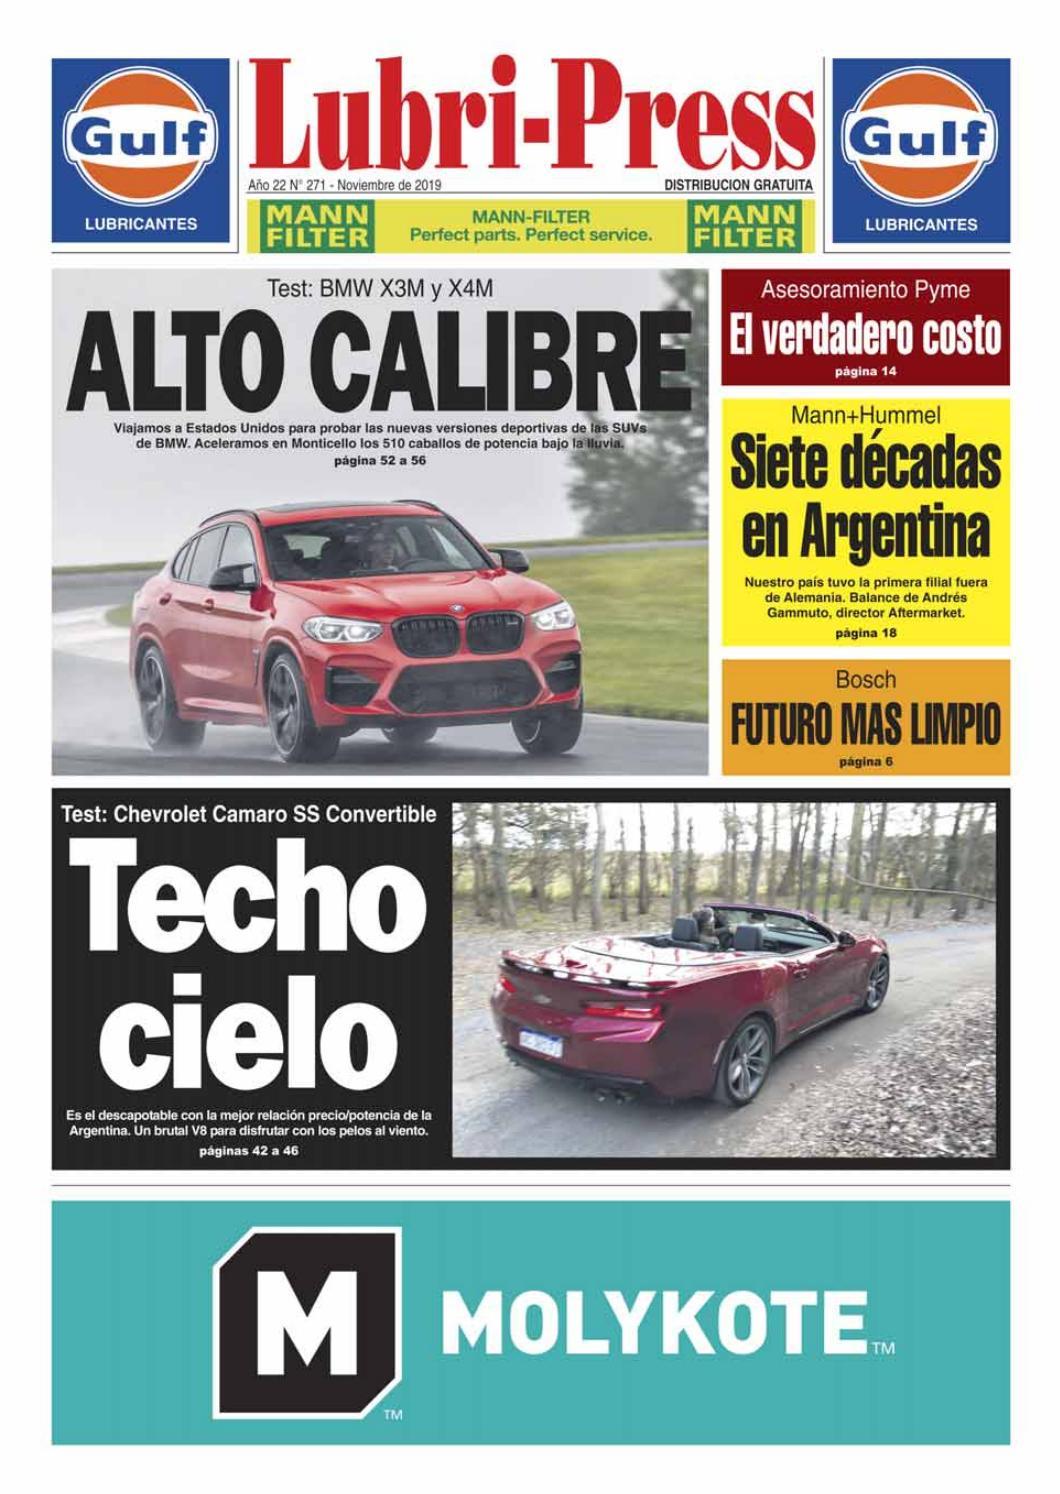 Renault 5 GT TURBO NUEVO TAPA DEL DISTRIBUIDOR MAREADO Polvo Tapa De Agua Sello Super durante cinco